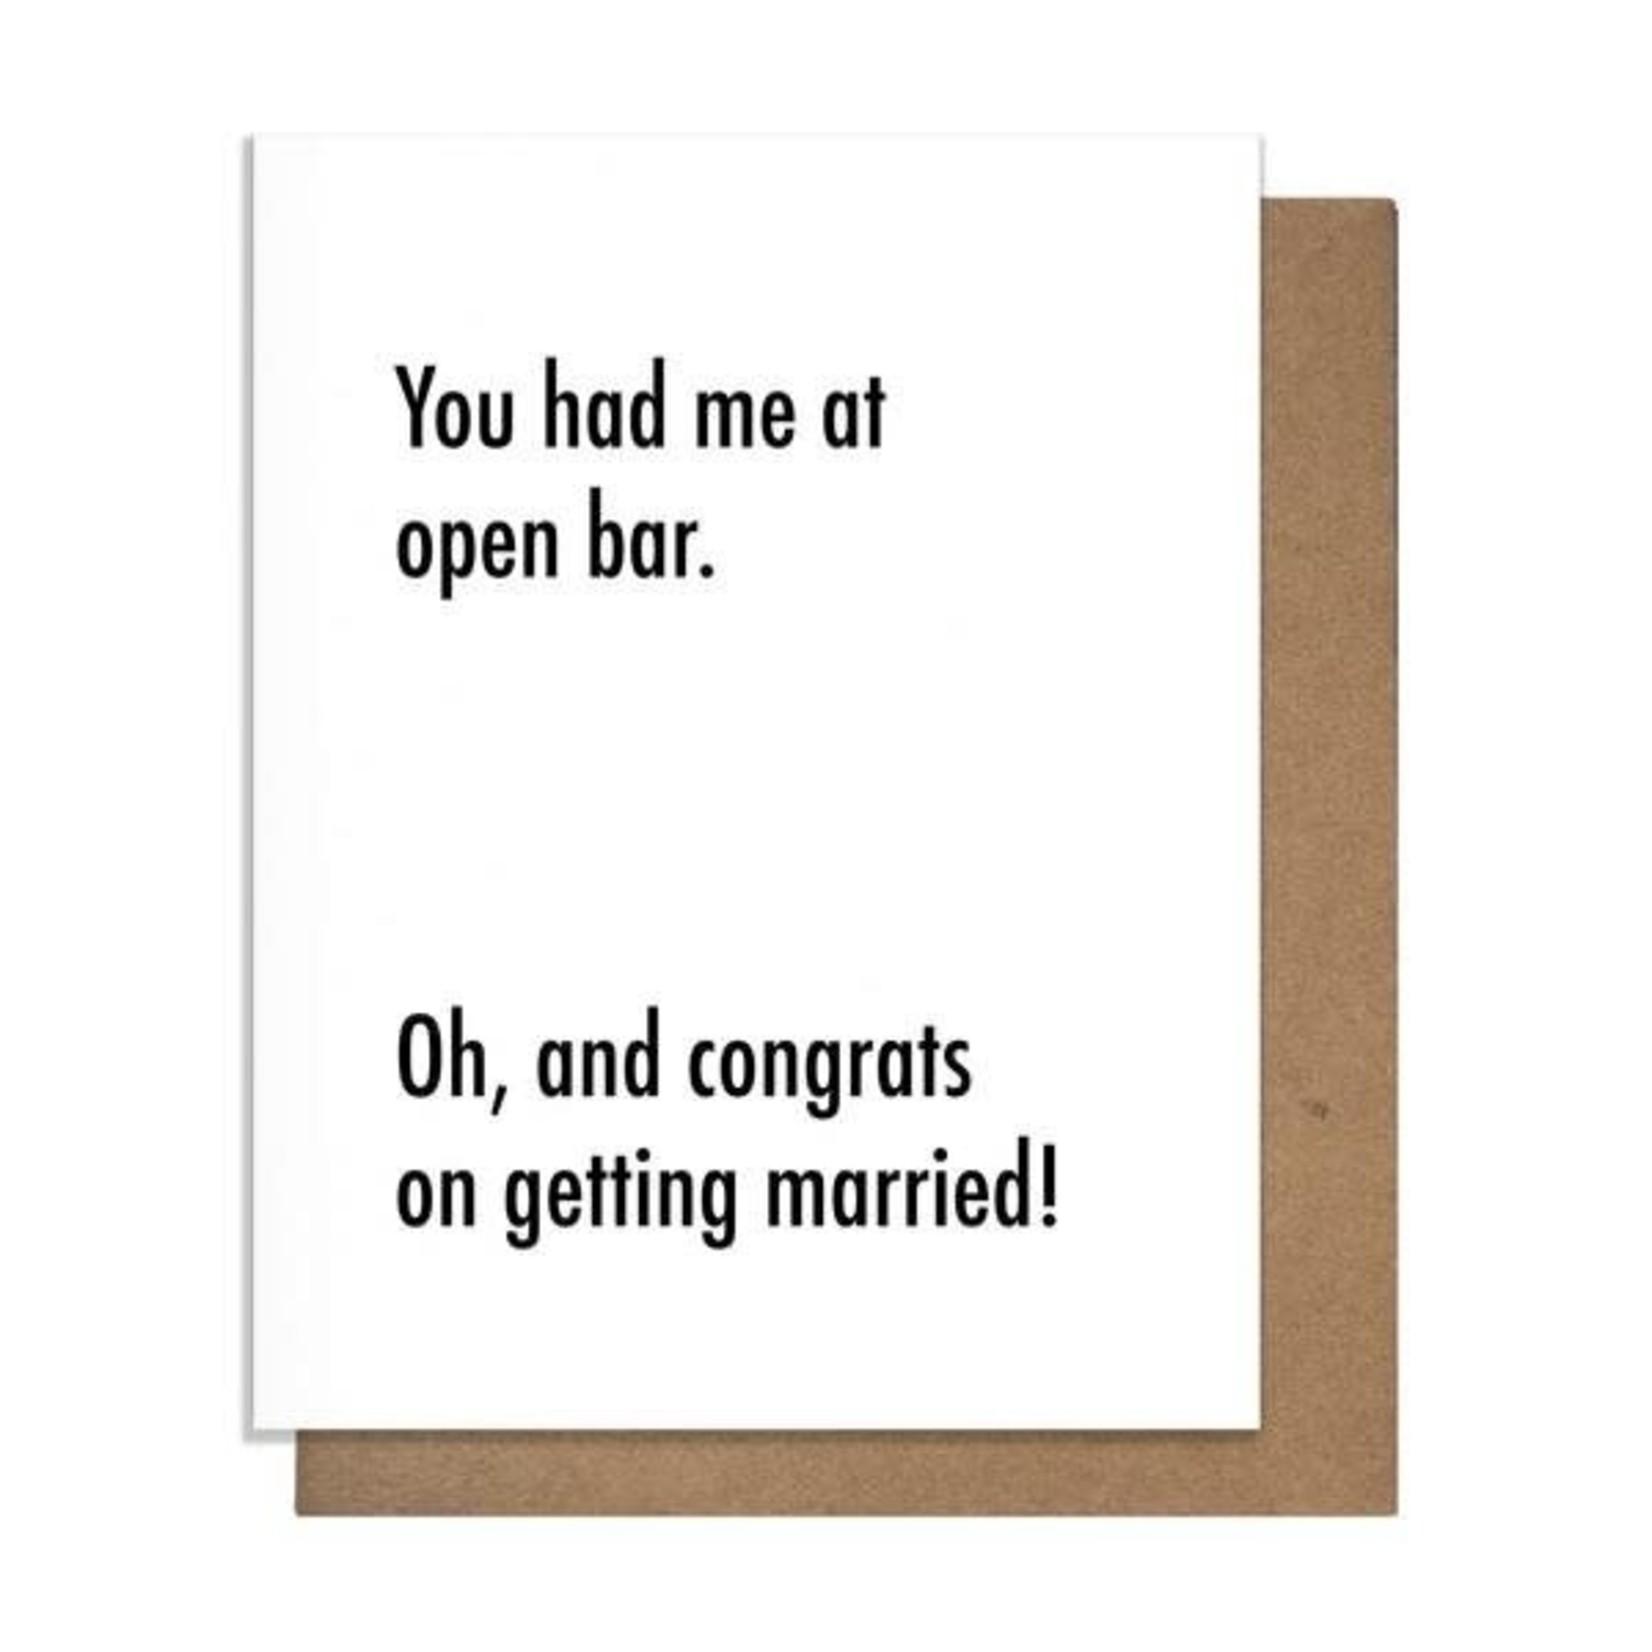 Pretty Alright Goods Open Bar Card